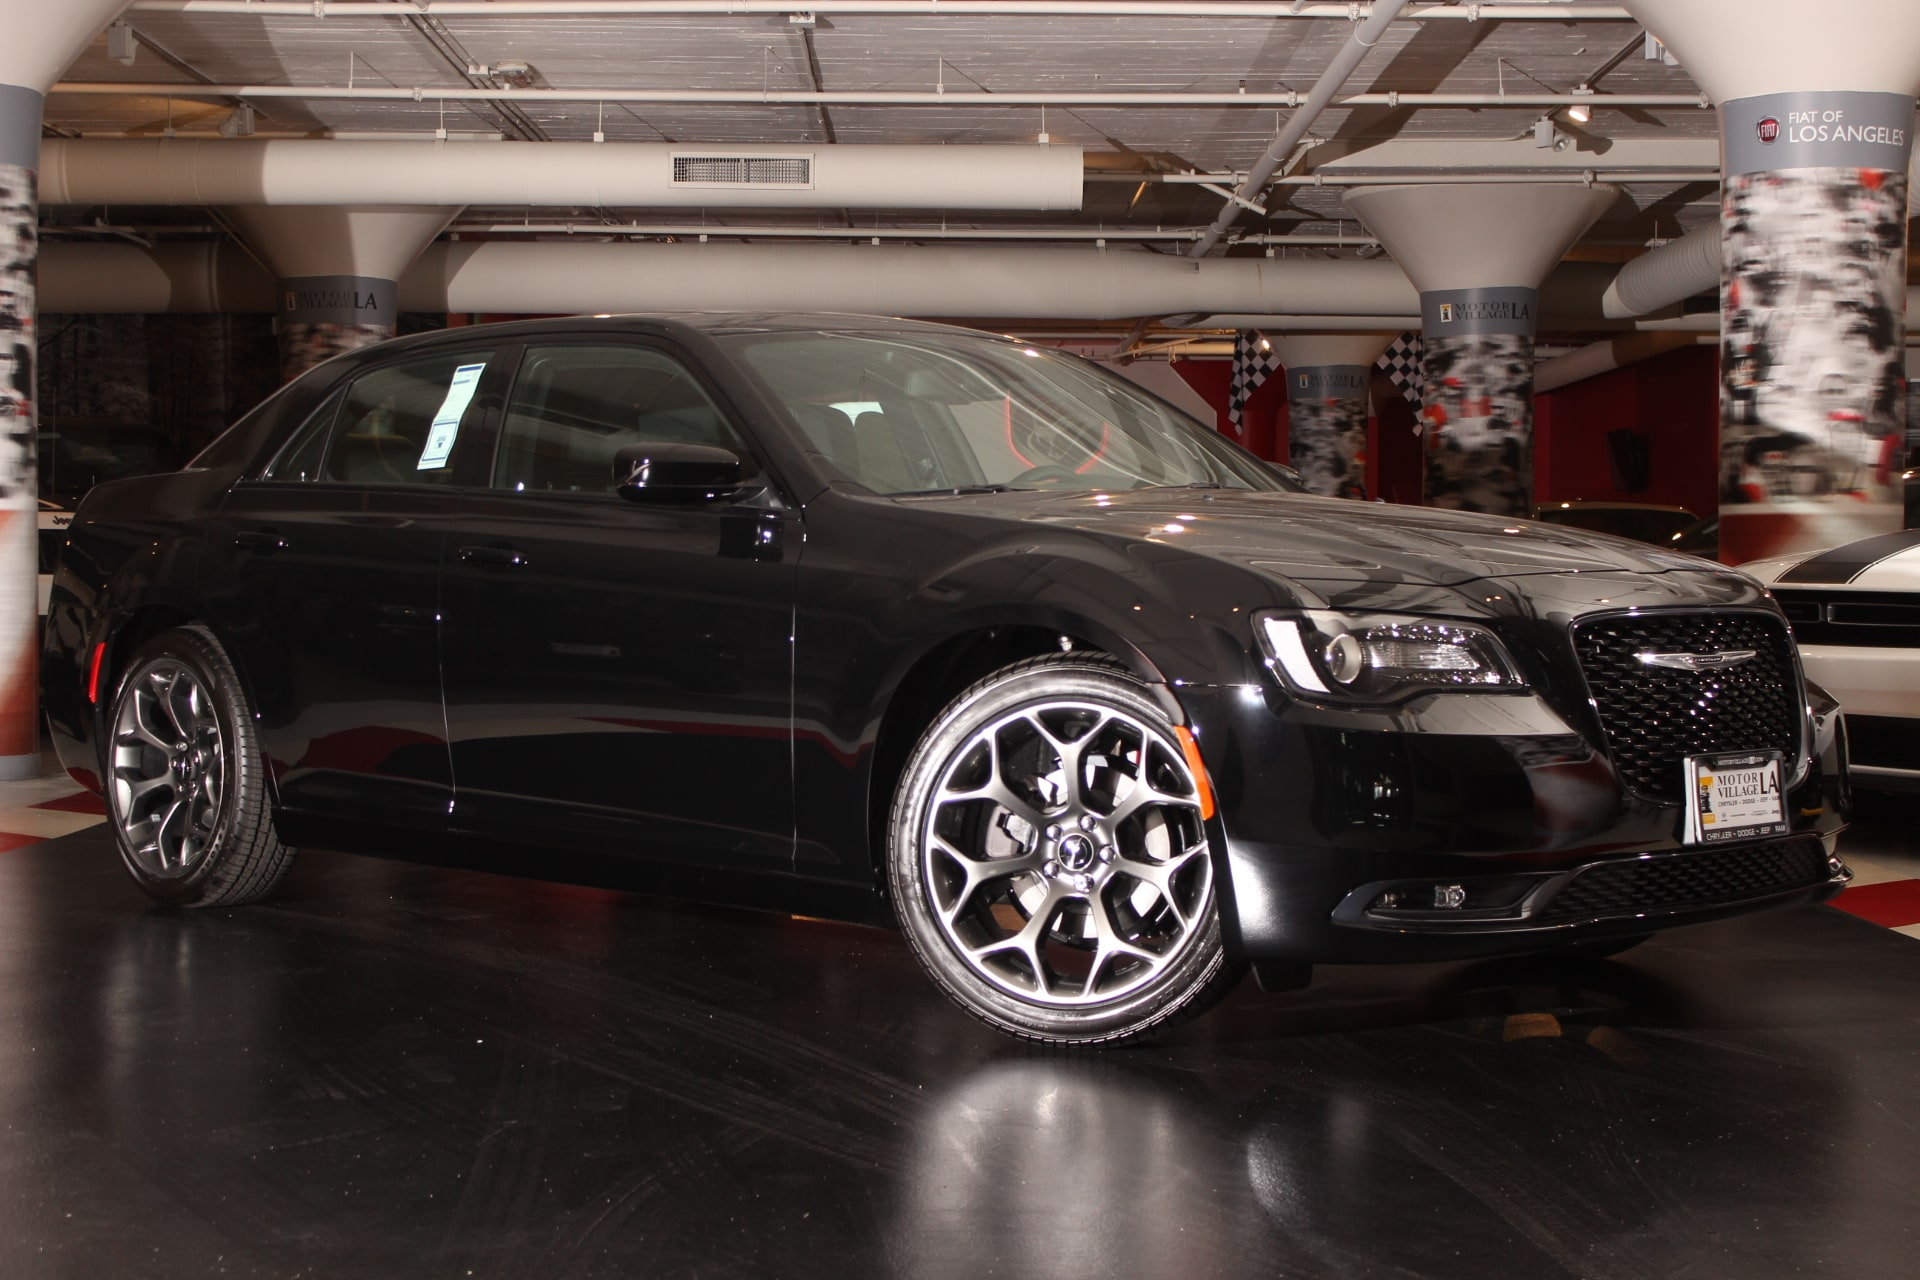 2017 Chrysler 300 S  50 State Emissions Dual-Pane Panoramic Sunroof Engine 36L V6 24V VVT Le